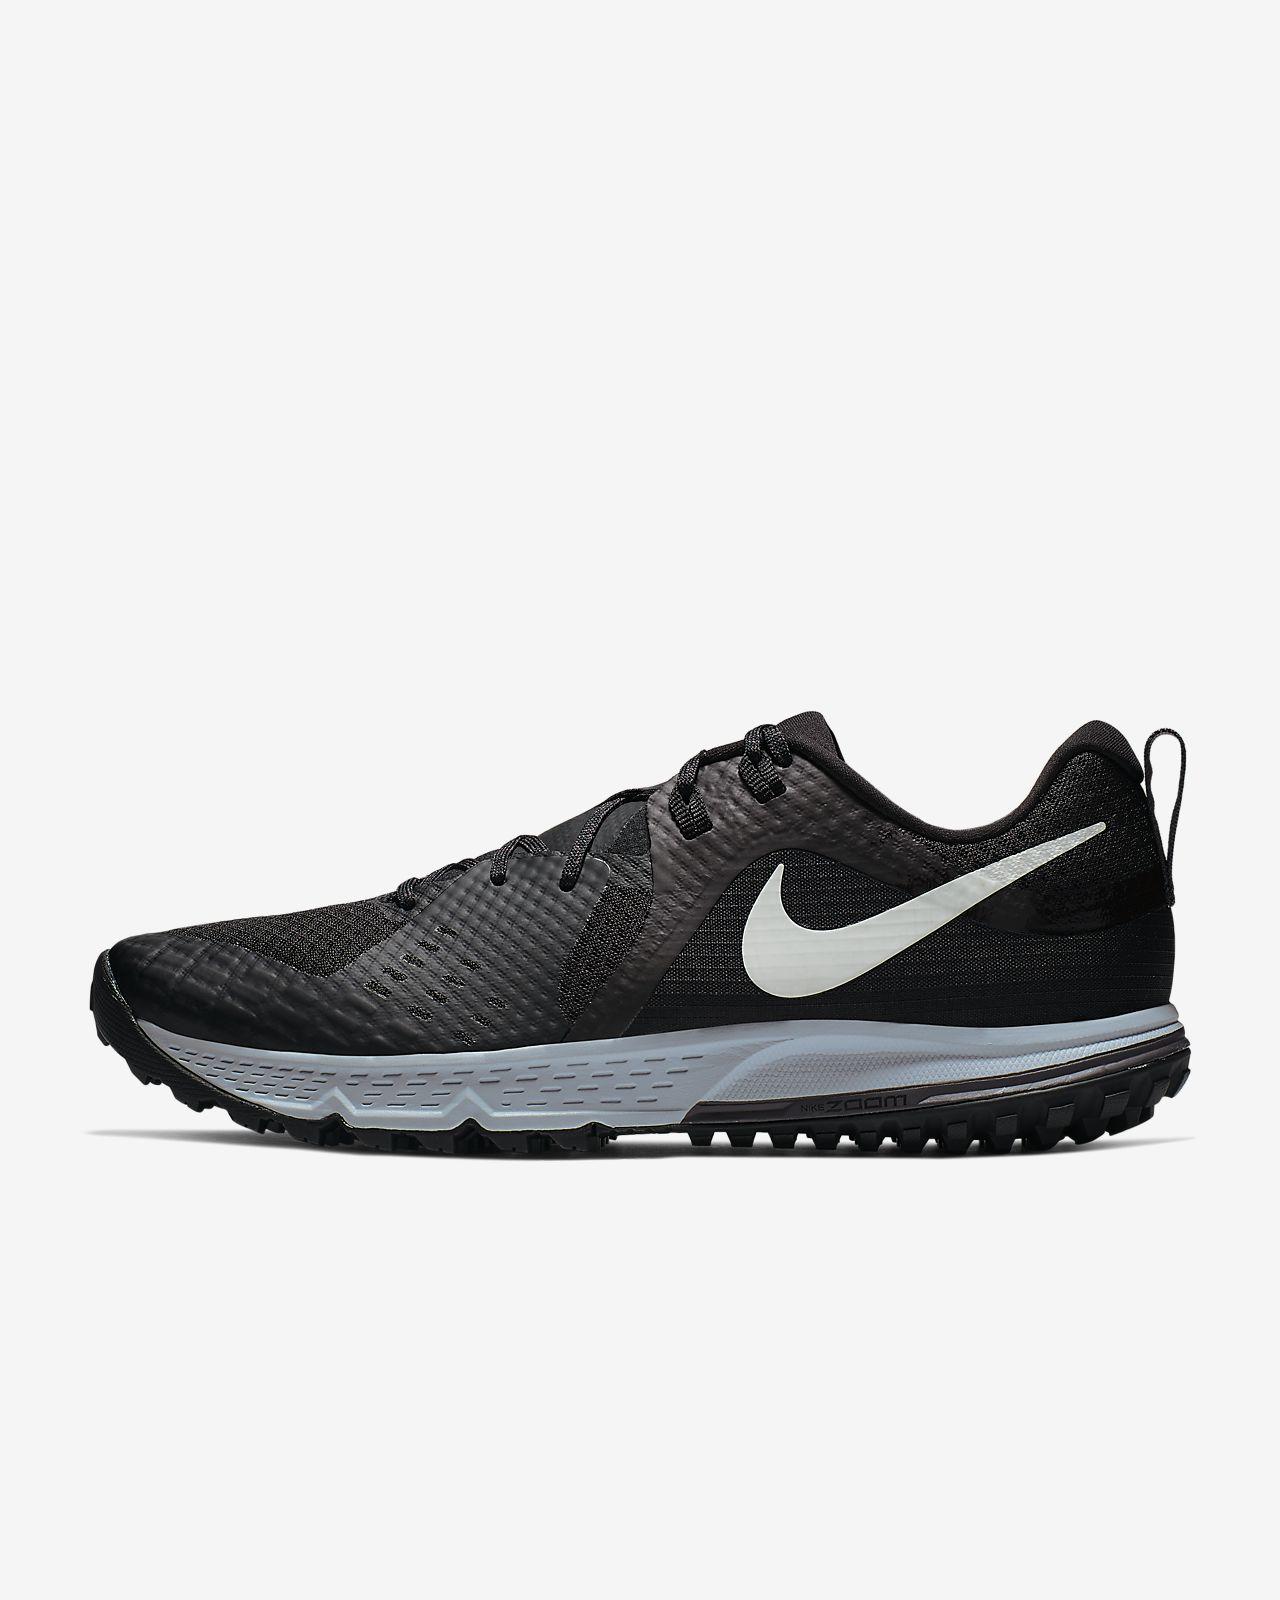 Sapatilhas de running Nike Air Zoom Wildhorse 5 para homem